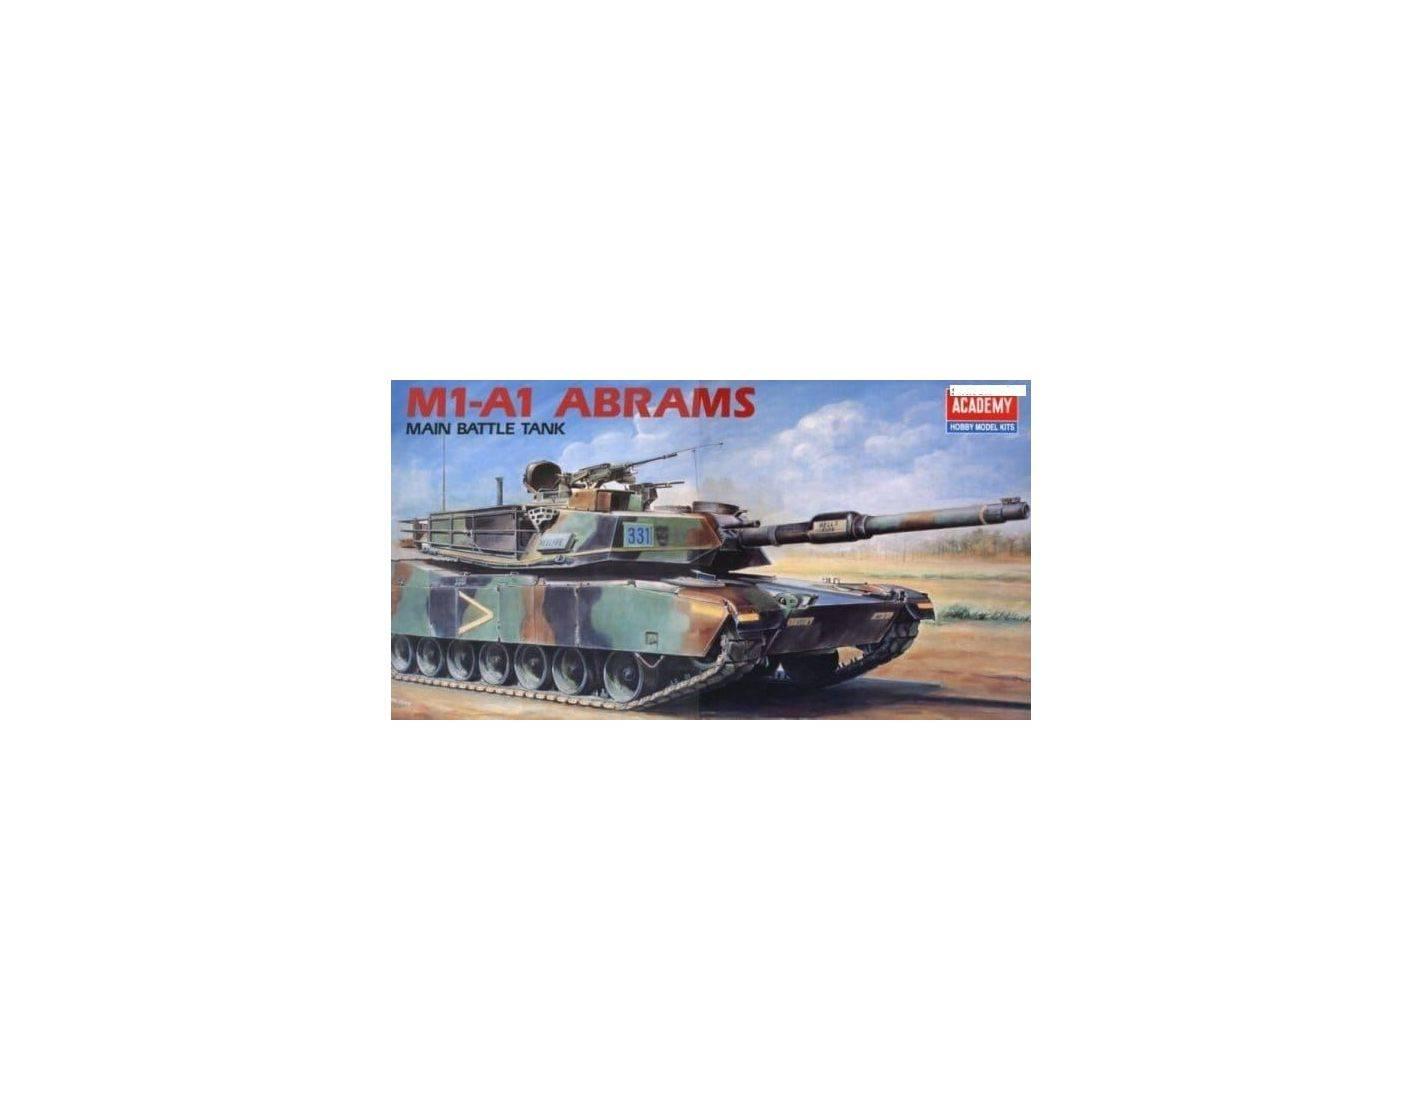 ACADEMY 1345 M1-A1 ABRAMS MAIN BATTLE TANK 1:35 Kit Modellino